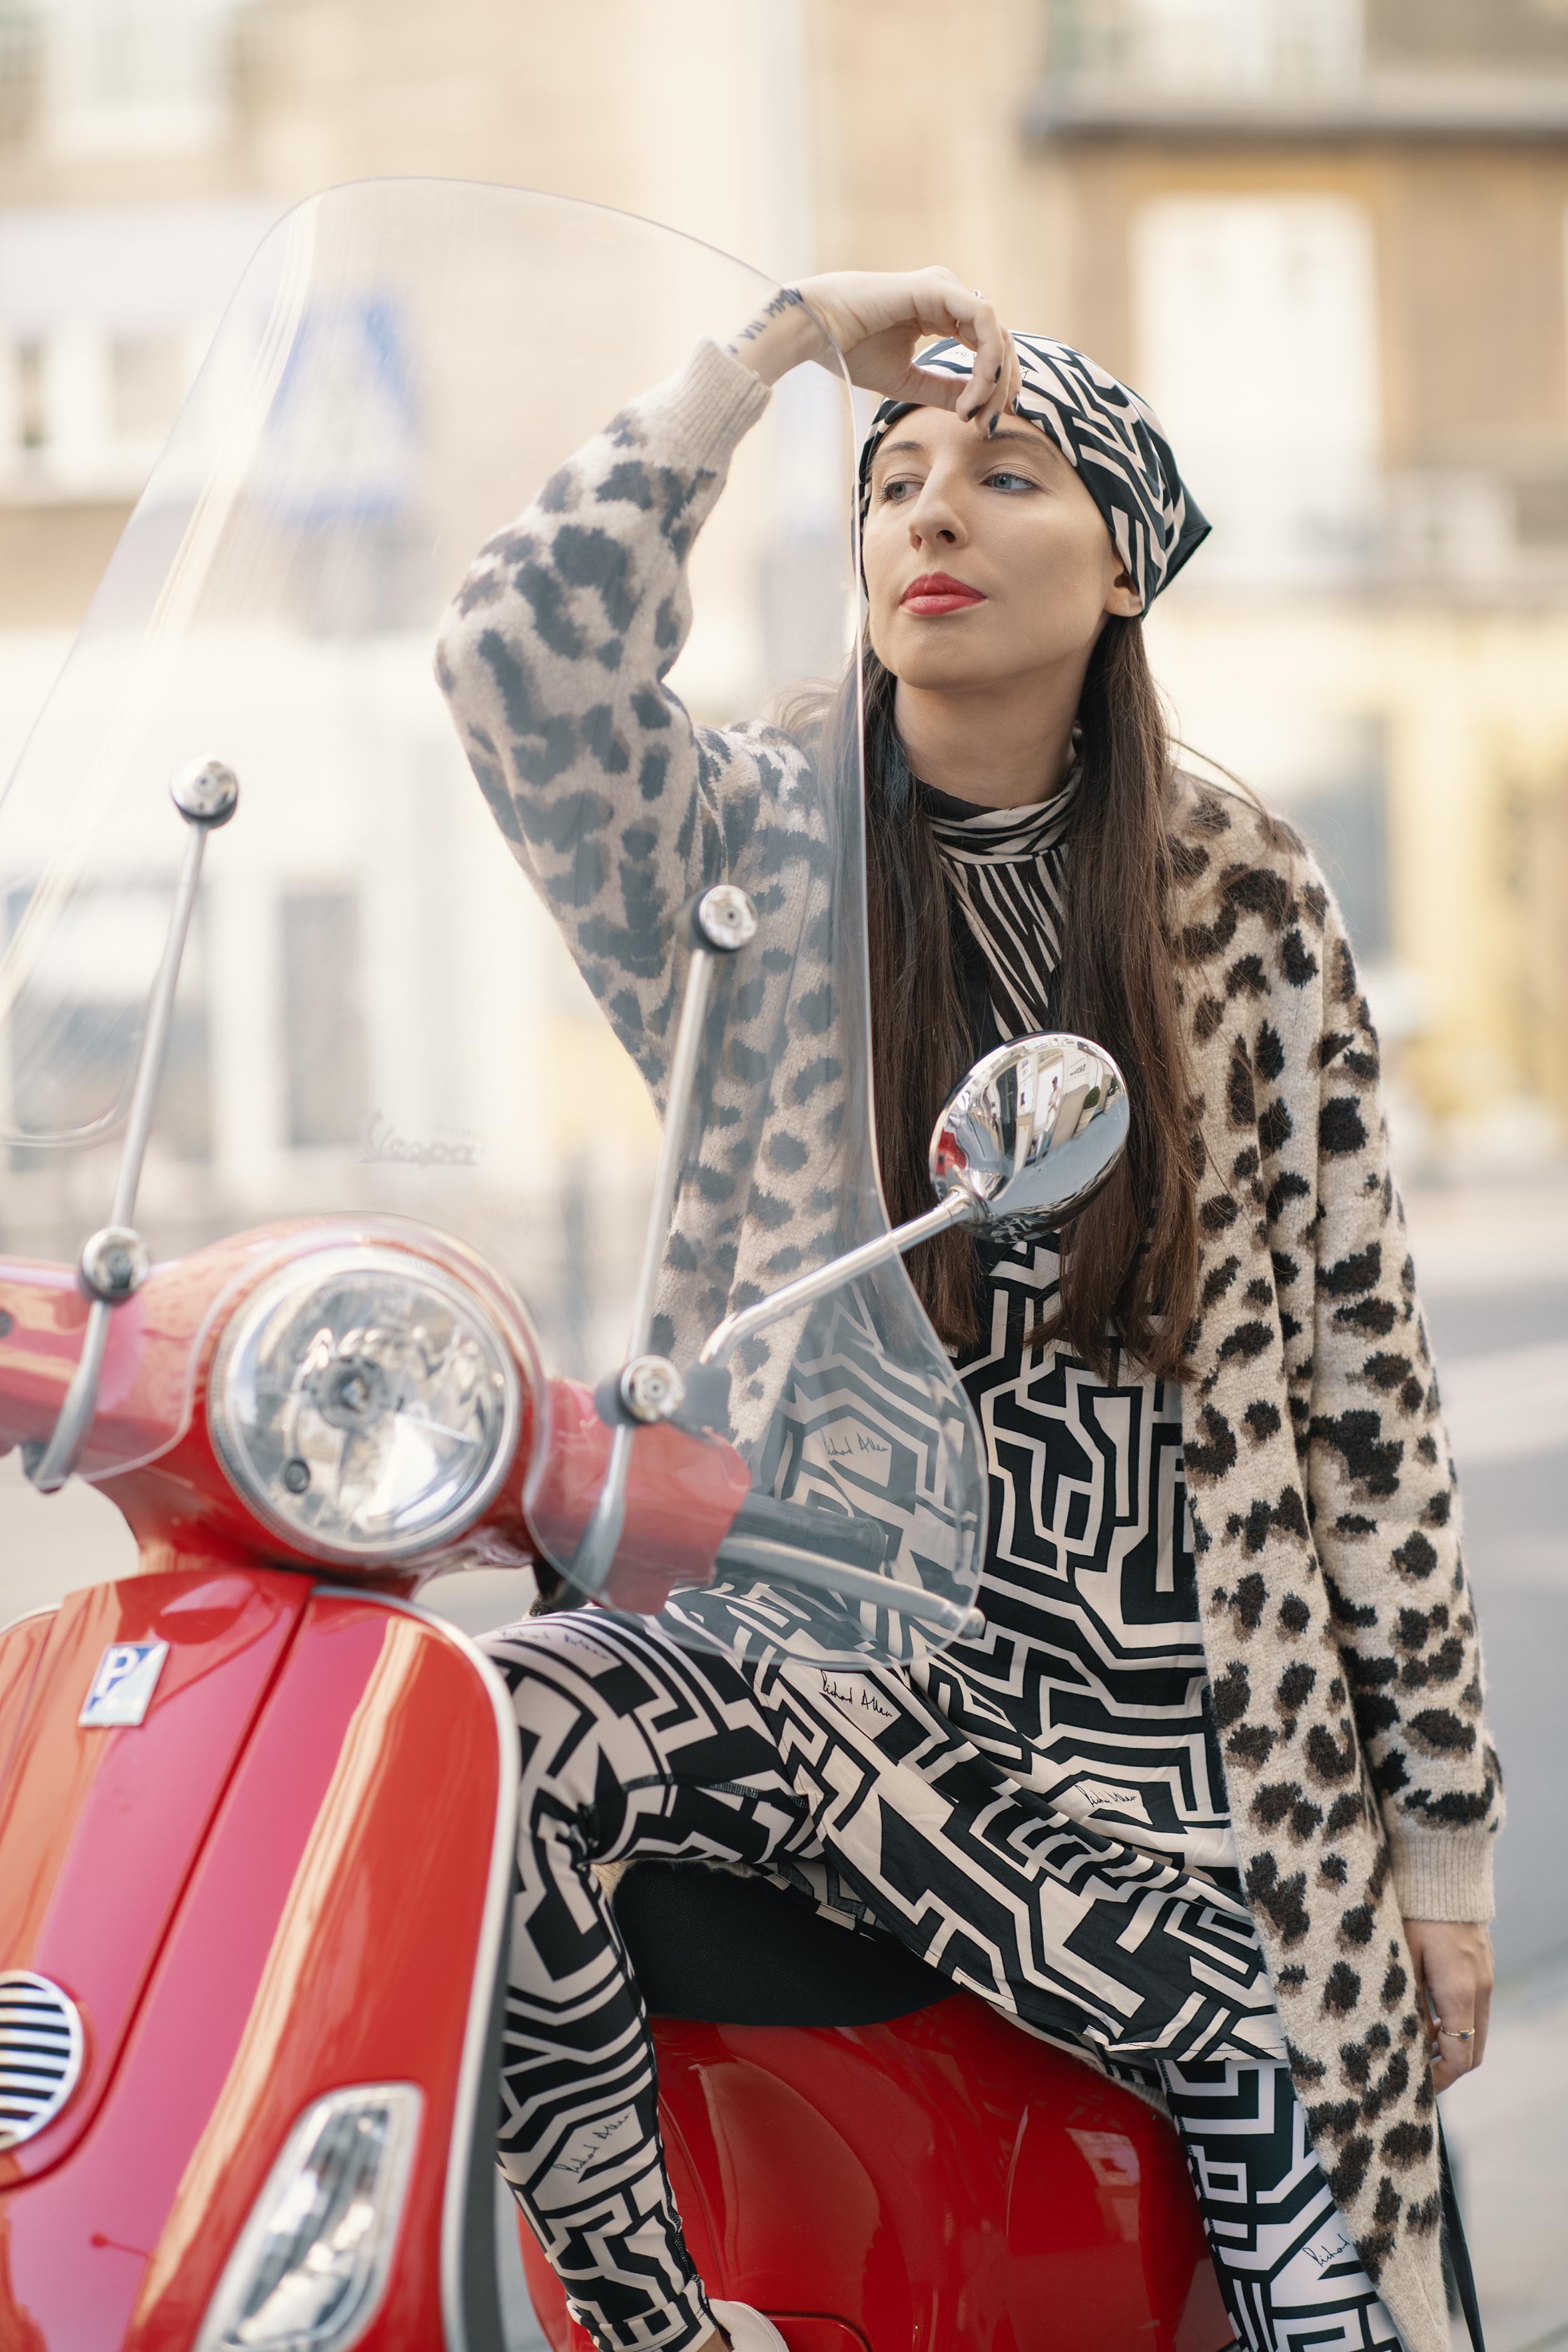 richard-allan-x-hM-streetwear-modauliczn